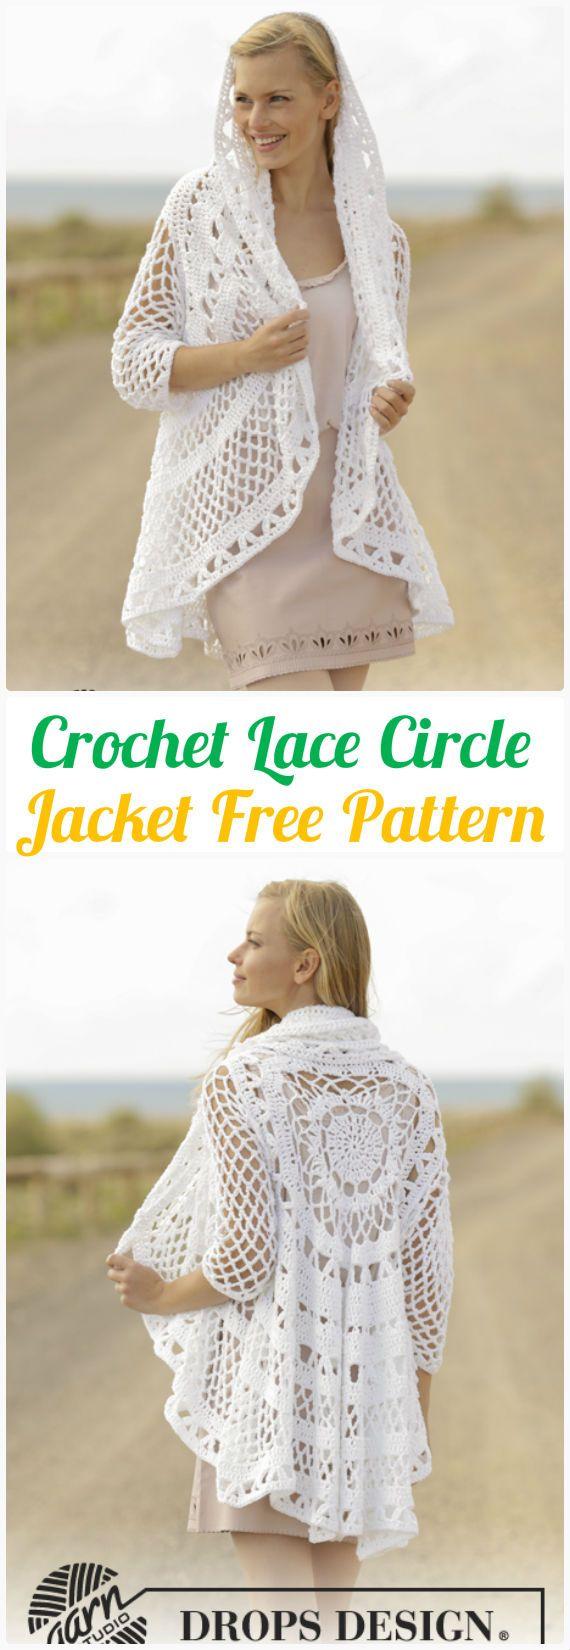 DIY Crochet Lace Circle Jacket Free Pattern-#Crochet Circular Vest Sweater #Jacket Patterns